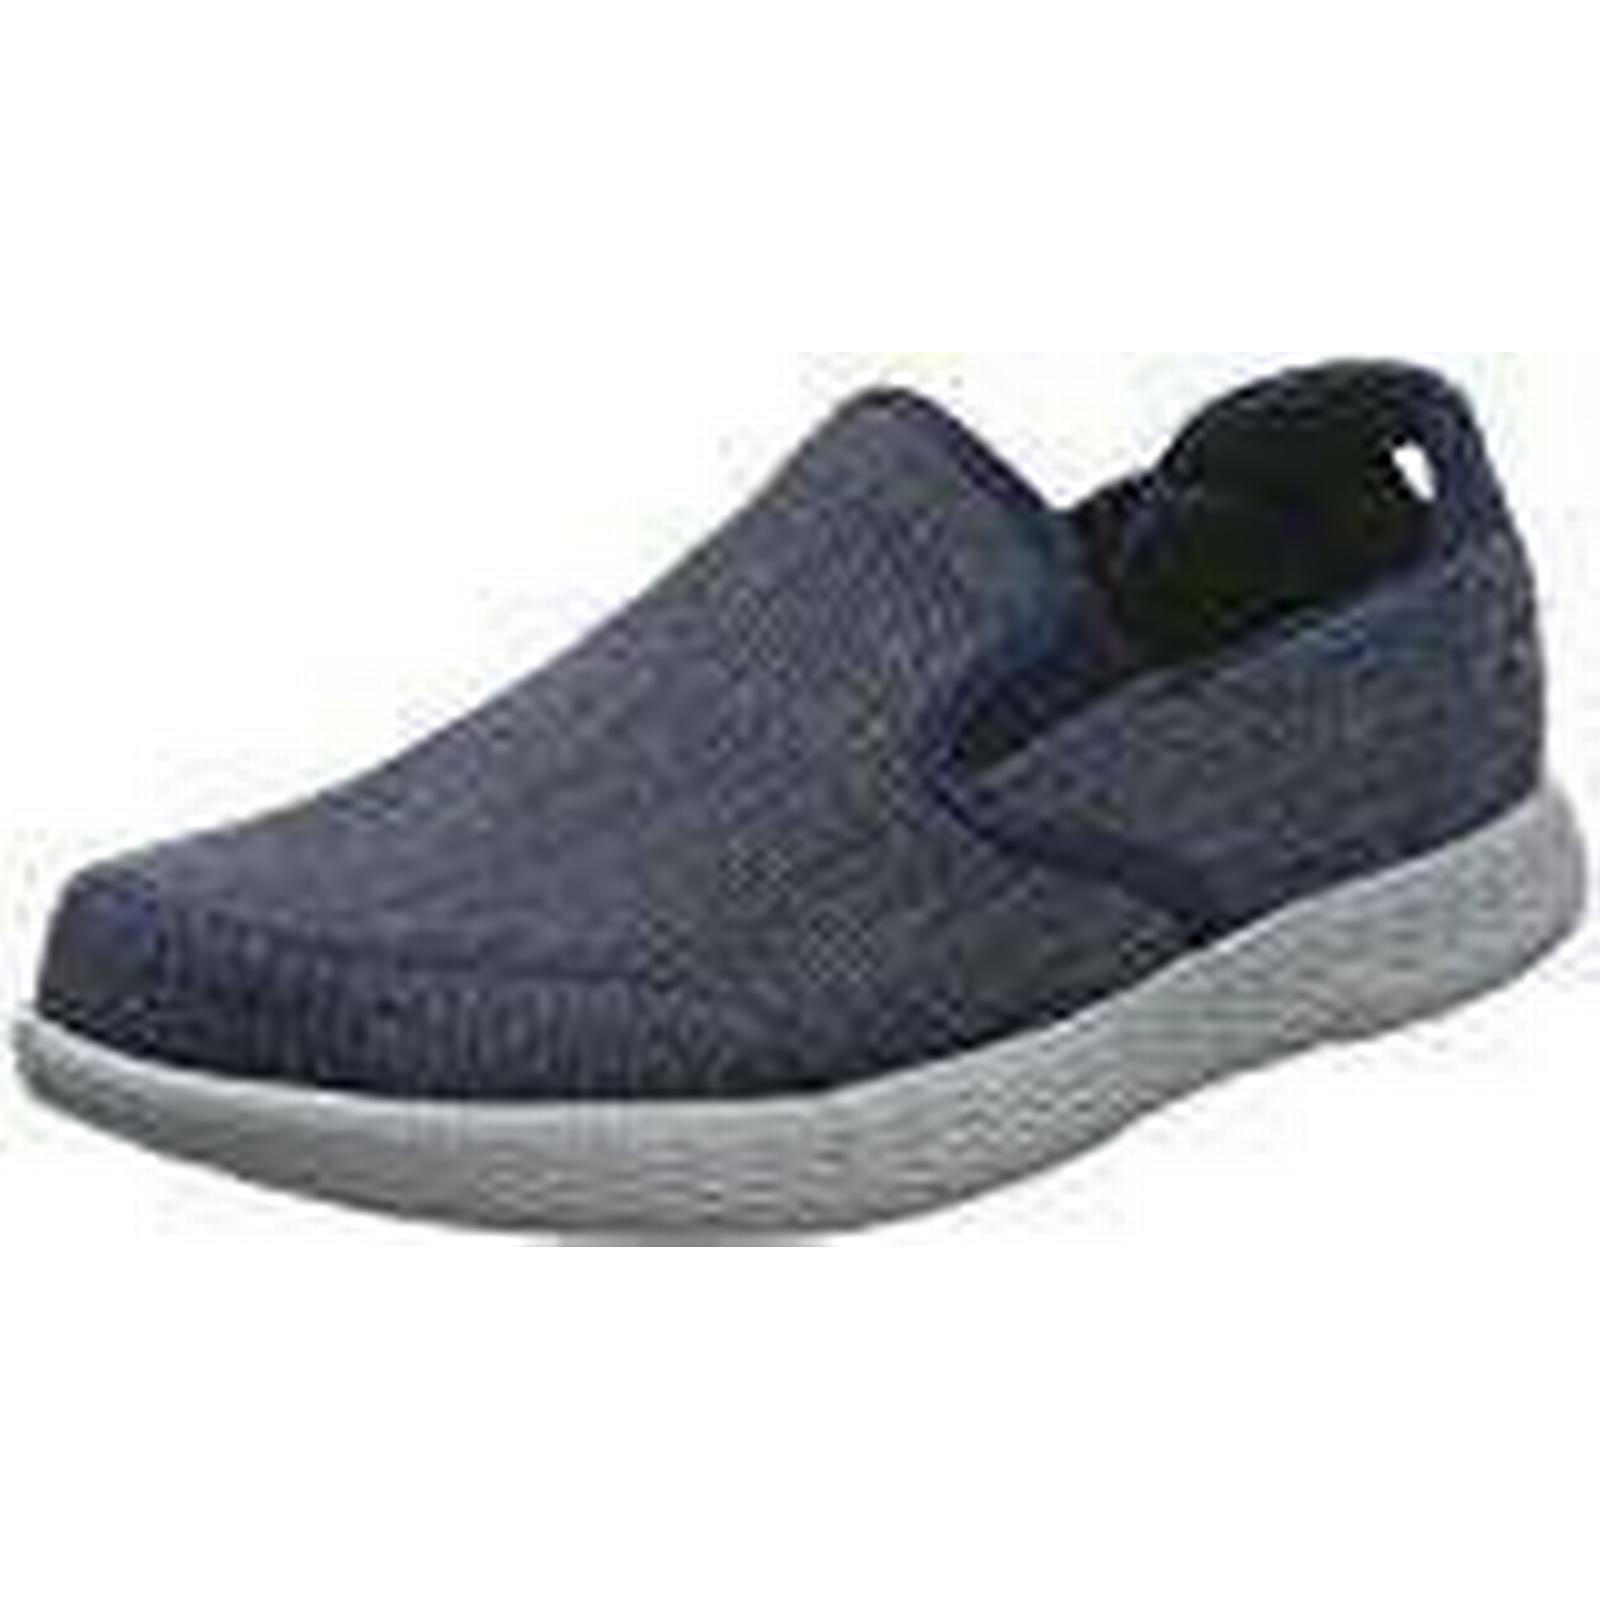 Skechers Men's 53781 UK Slip On Trainers, Blue (Navy/Grey), 9 UK 53781 43.5 EU ae4c92